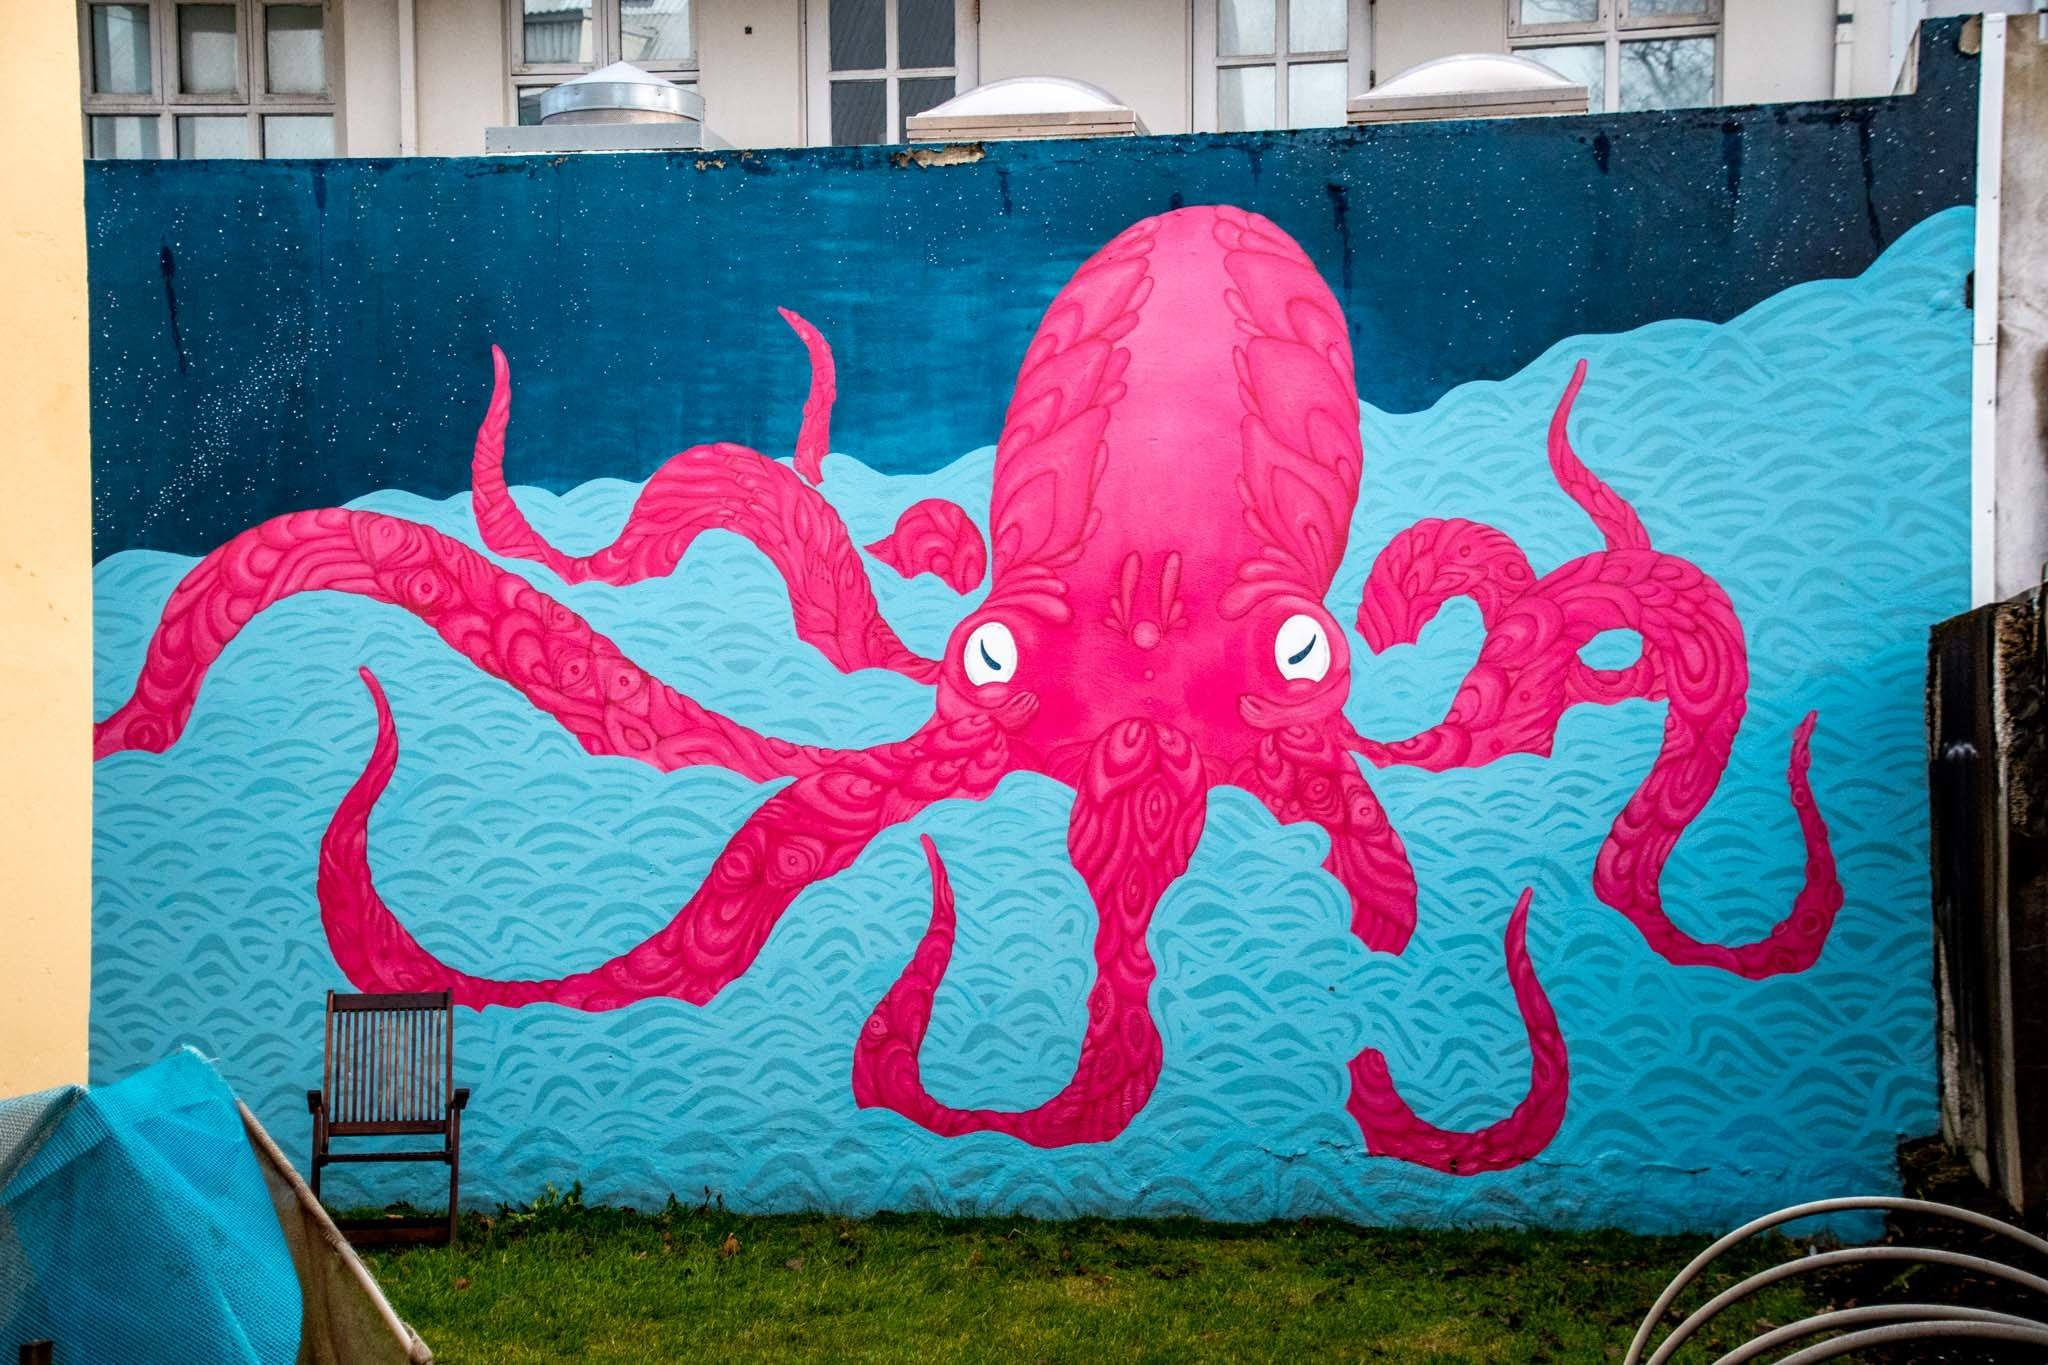 Pink octopus mural, part of the Reykjavik street art scene.